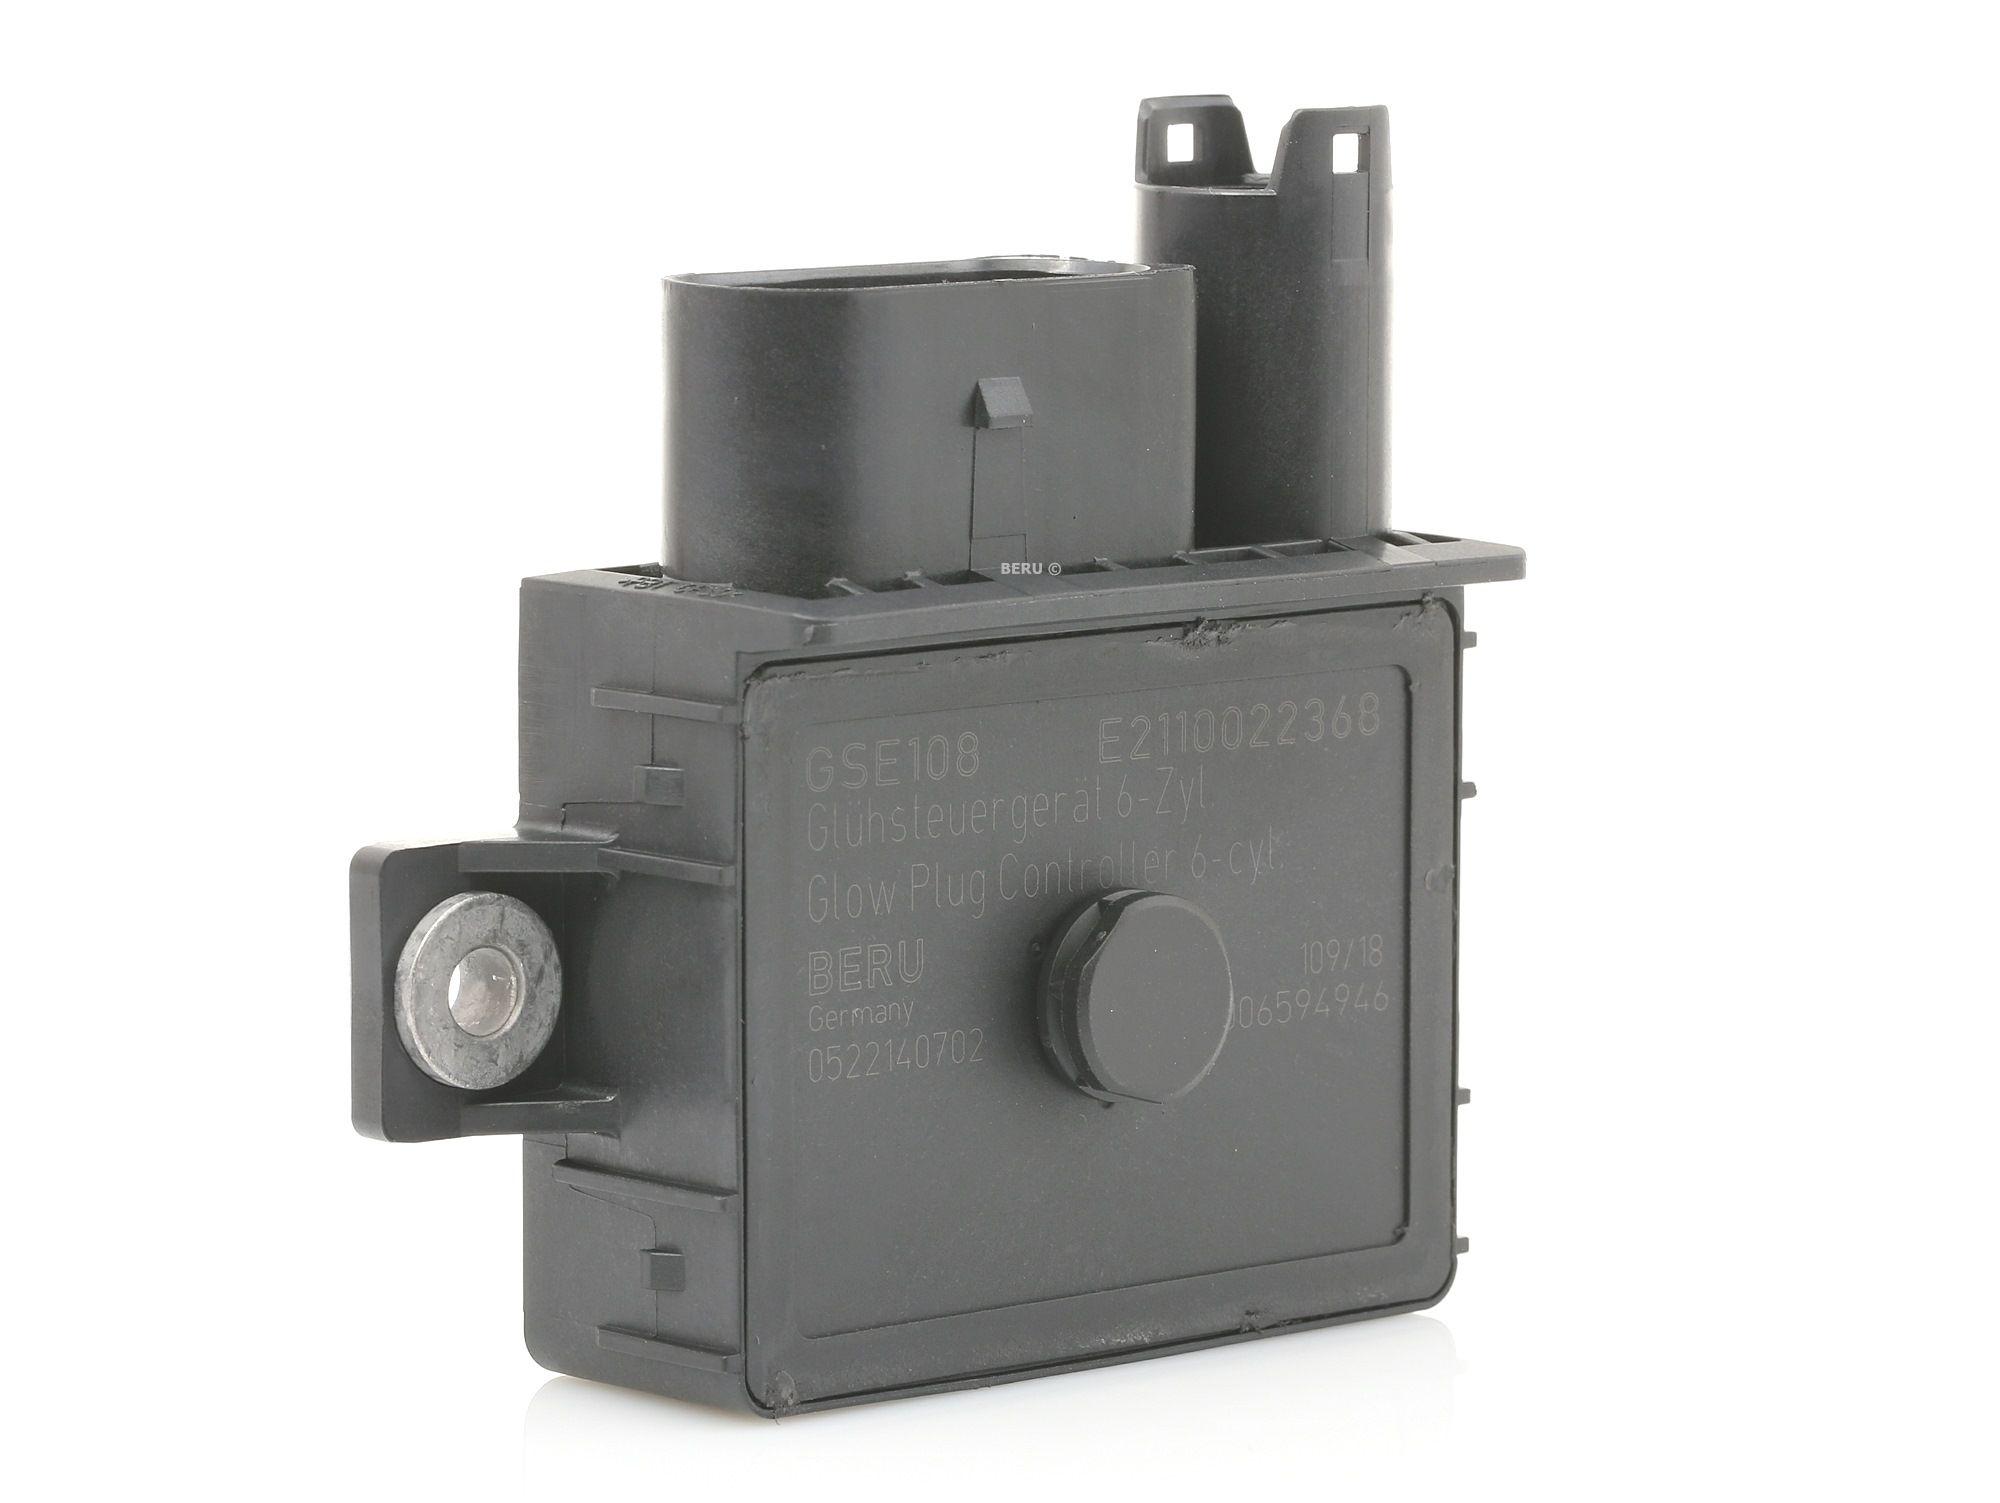 Control Unit, glow plug system BERU GSE108 rating